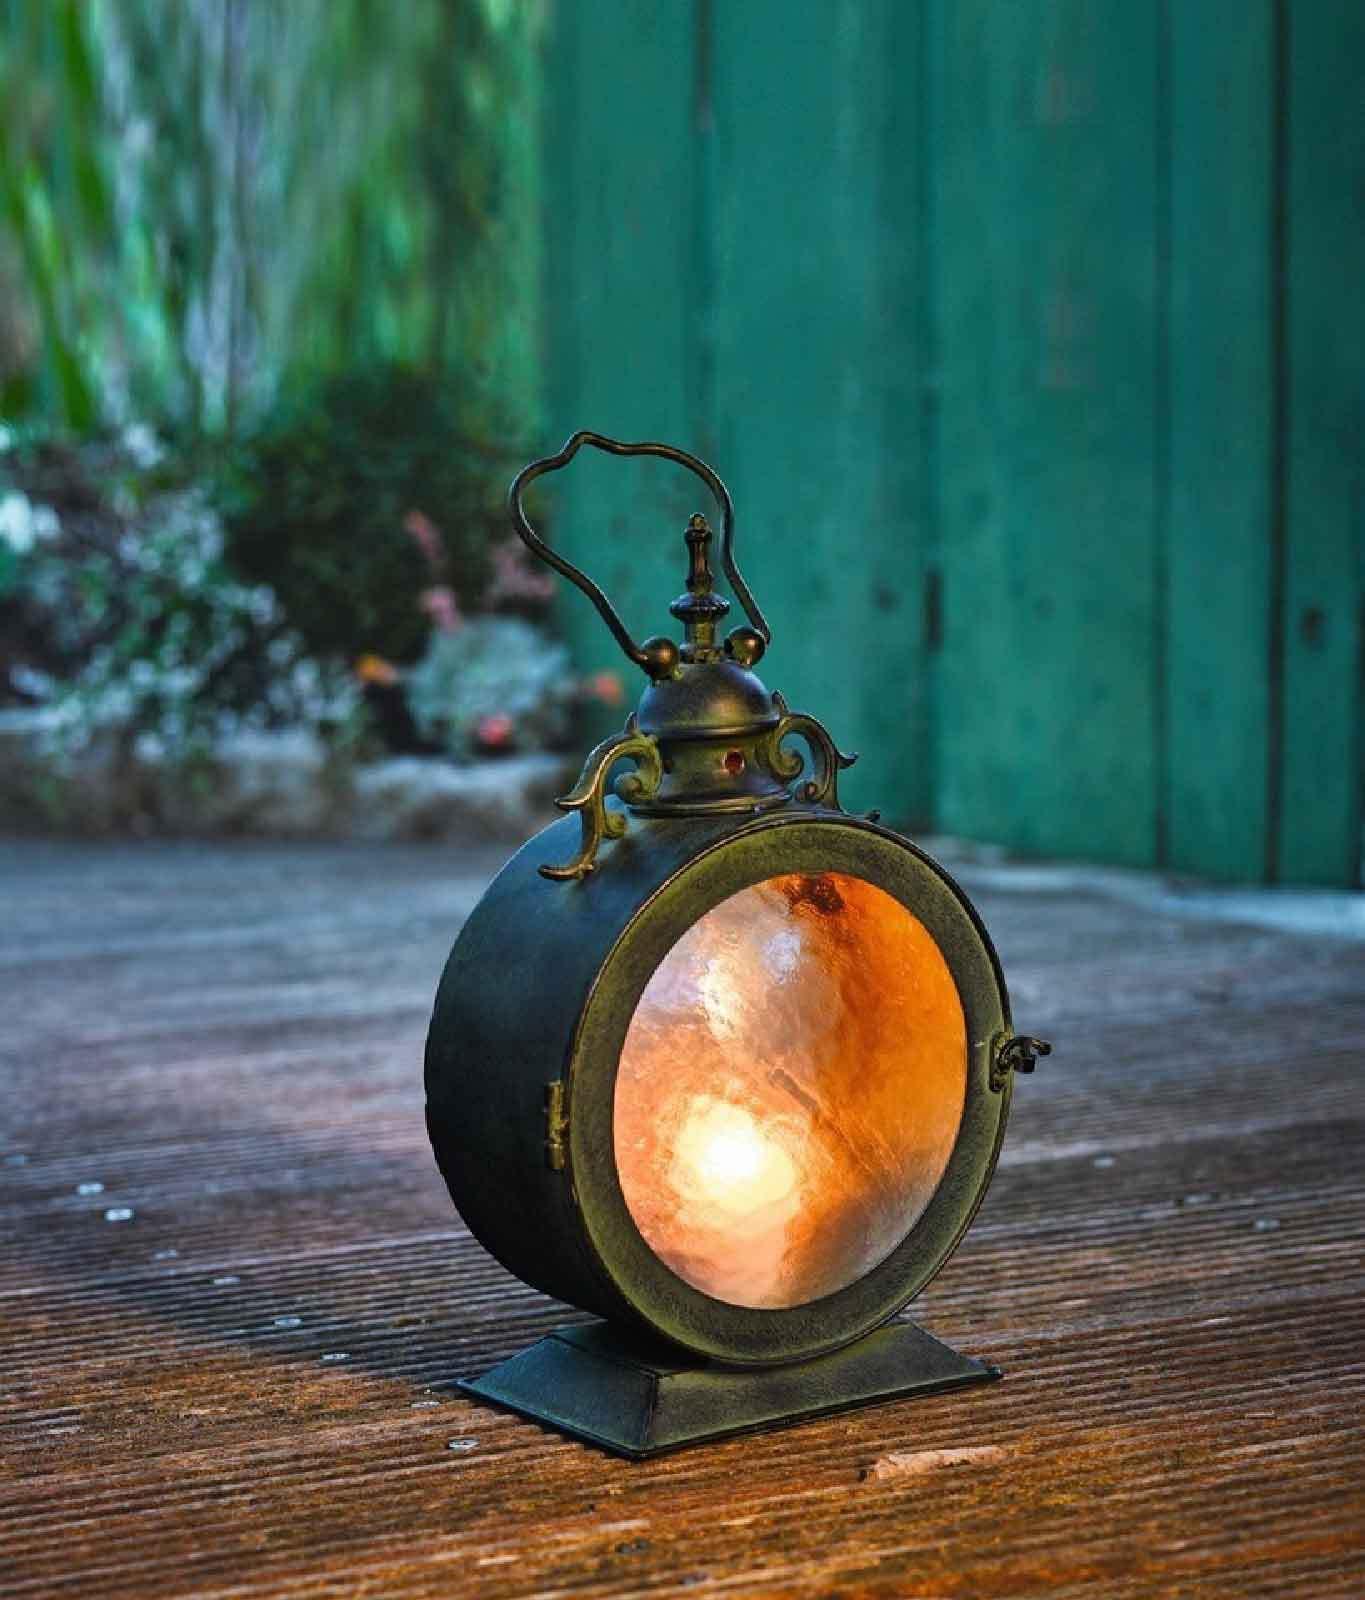 Metall Laterne Bullauge Windlicht Kerzenhalter Gartenlaterne Gartenlampe Deko